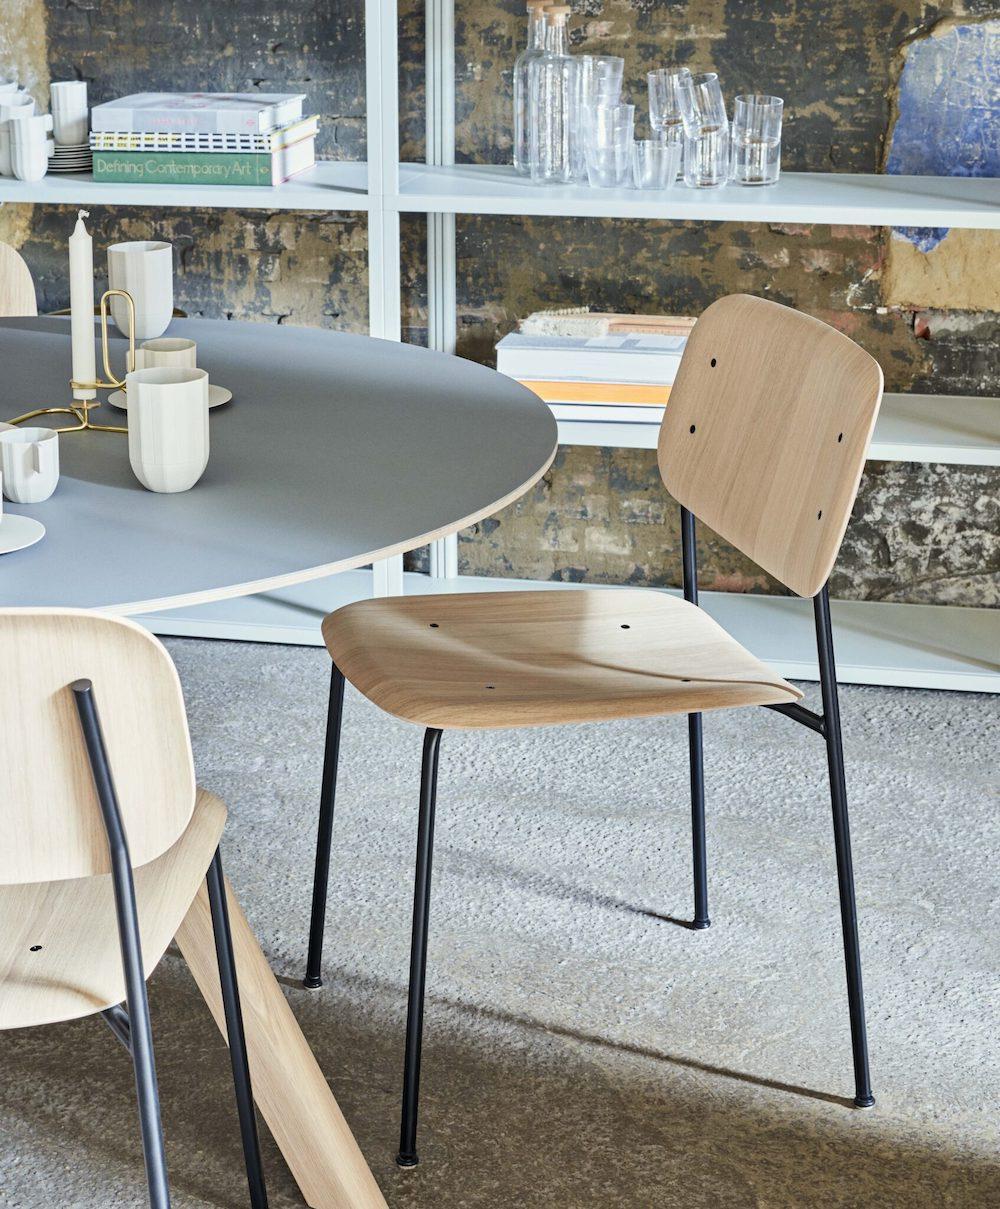 Soft-Edge-10-Base-black-Seat-Back-matt-lacquered-oak_CPH20-Table-grey-linoleum-top